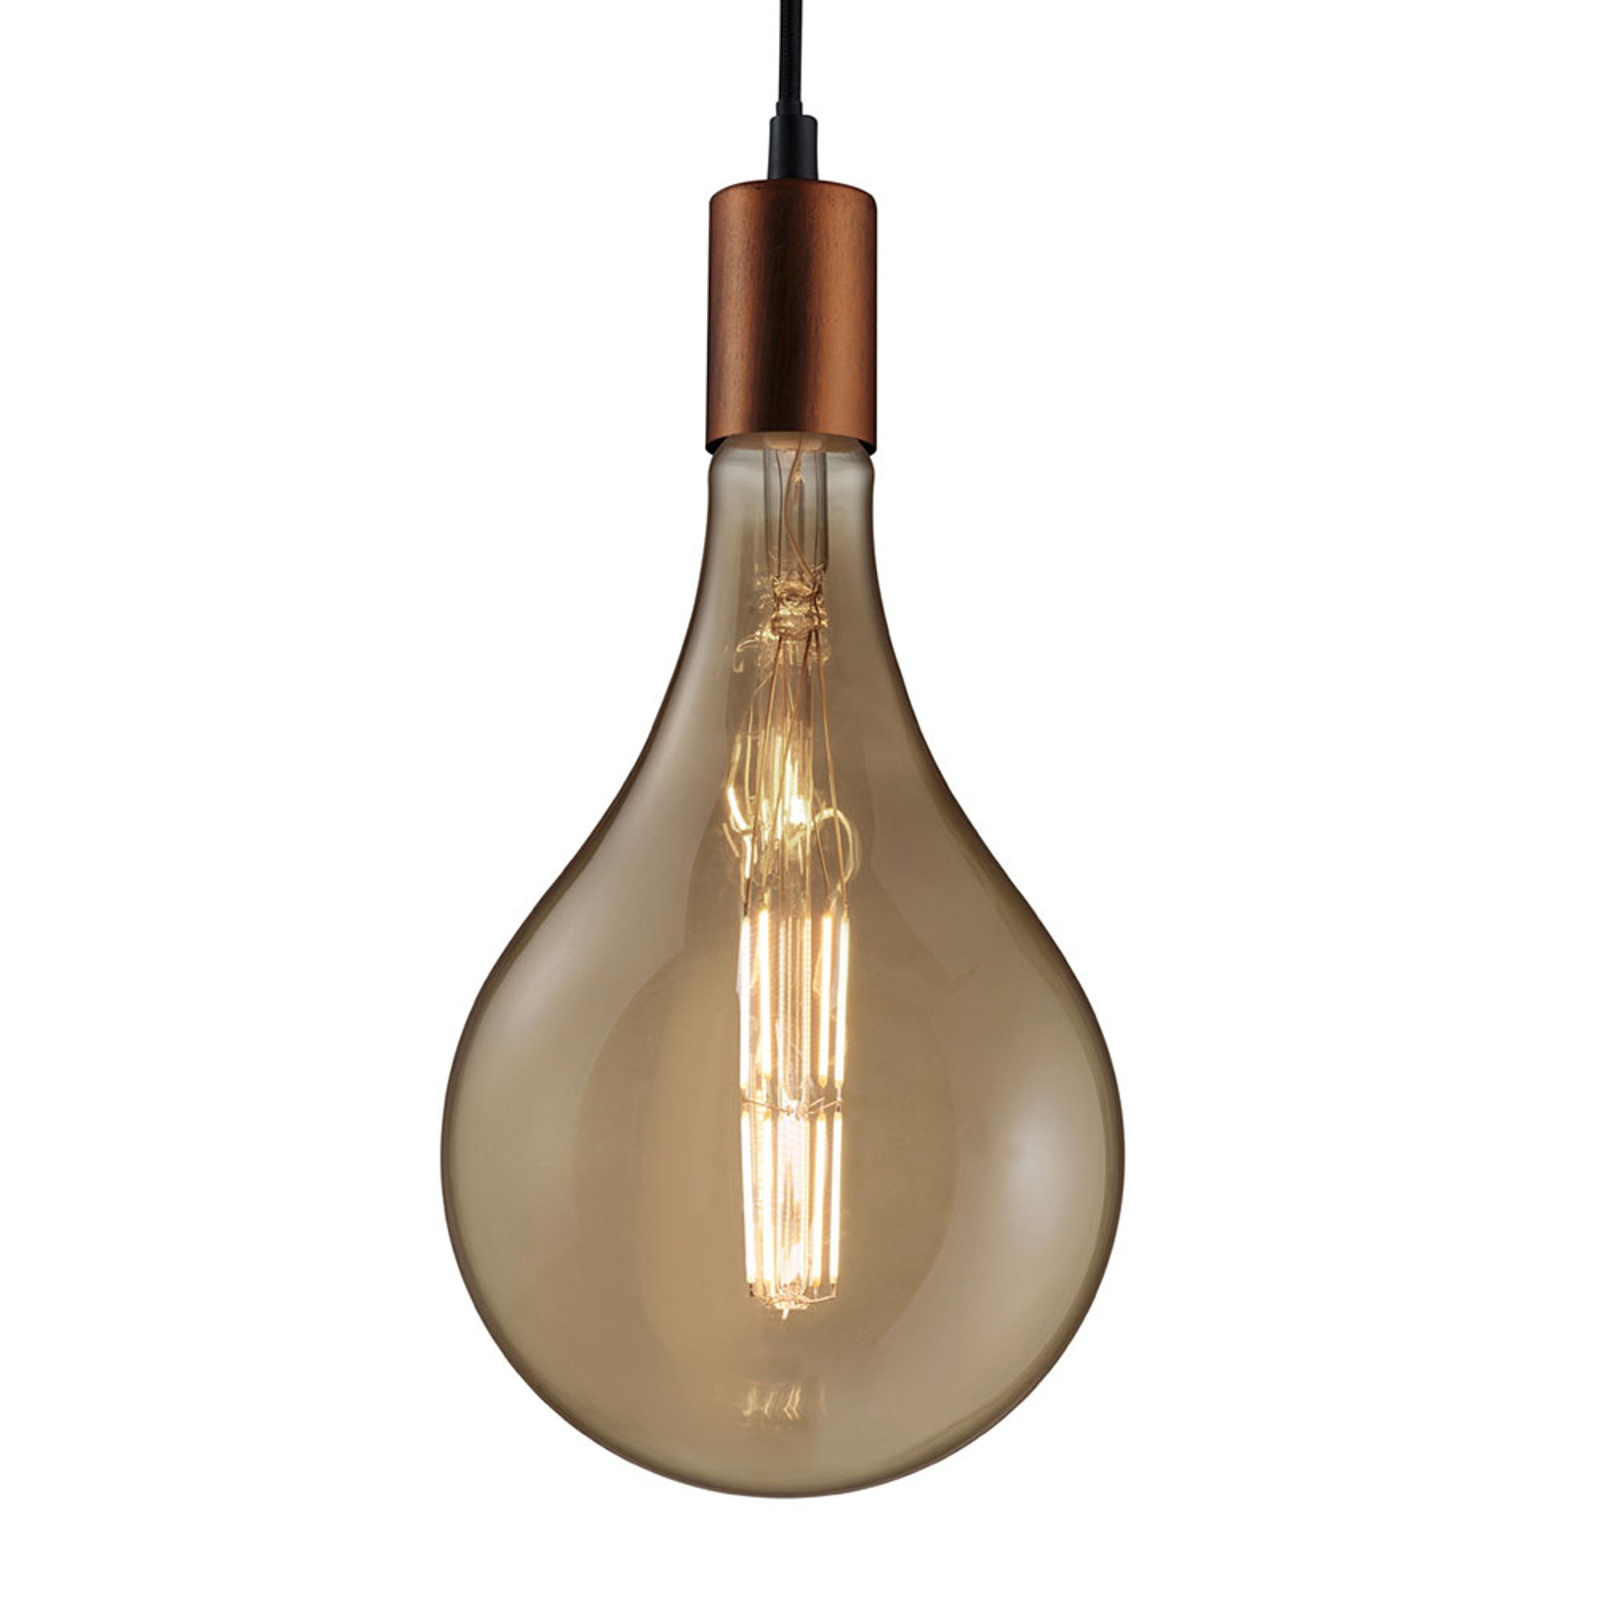 WiZ E27 Giant LED-dråbepære, 7 W, dim CCT filament